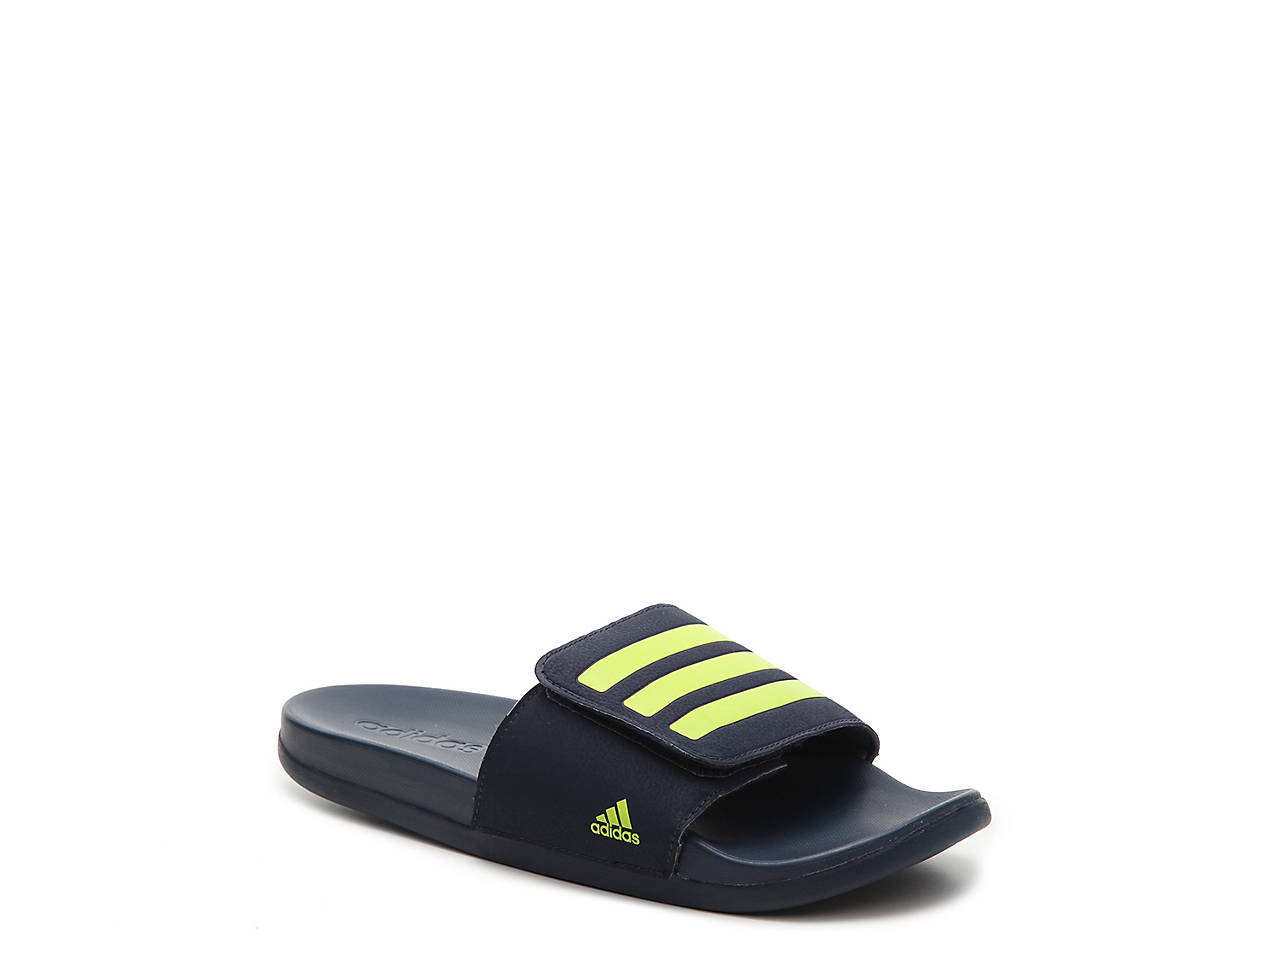 1f984e1ce442c adidas Adilette Cloudfoam Plus Youth Slide Sandal Kids Shoes